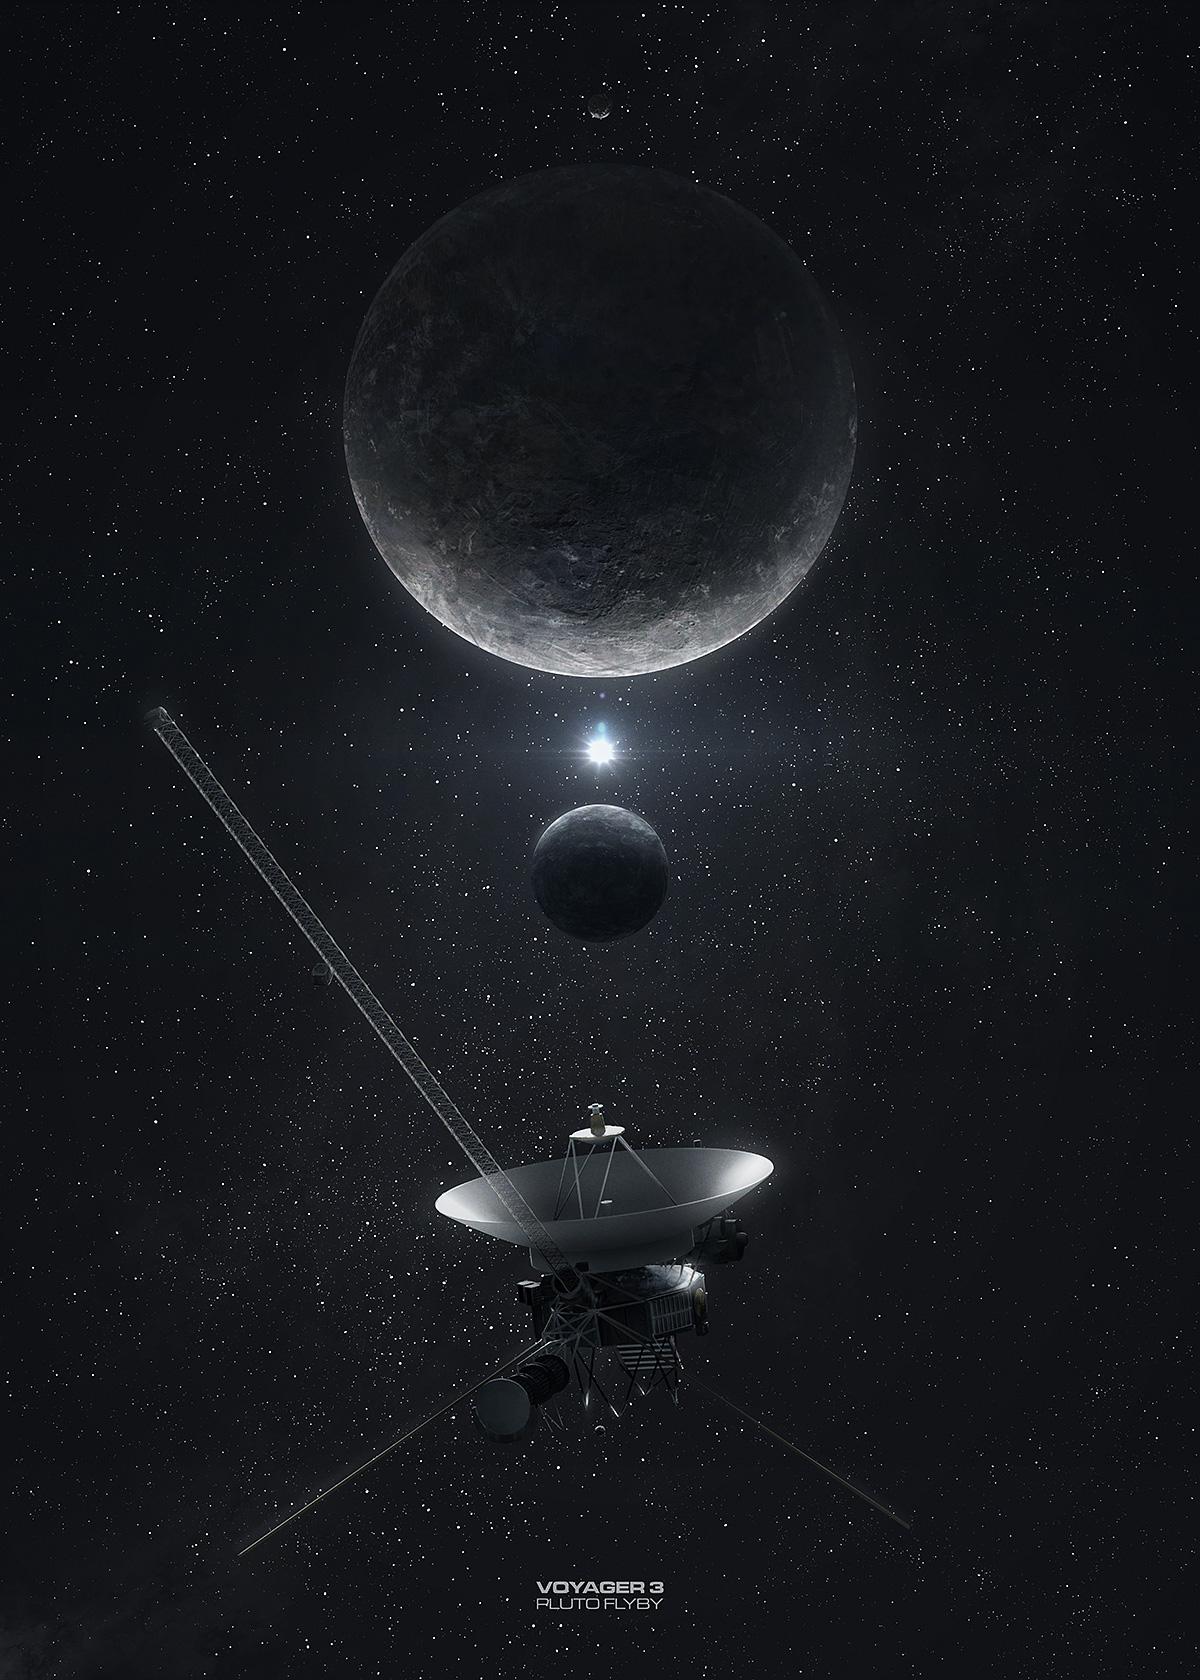 pluto voyager probe - photo #3